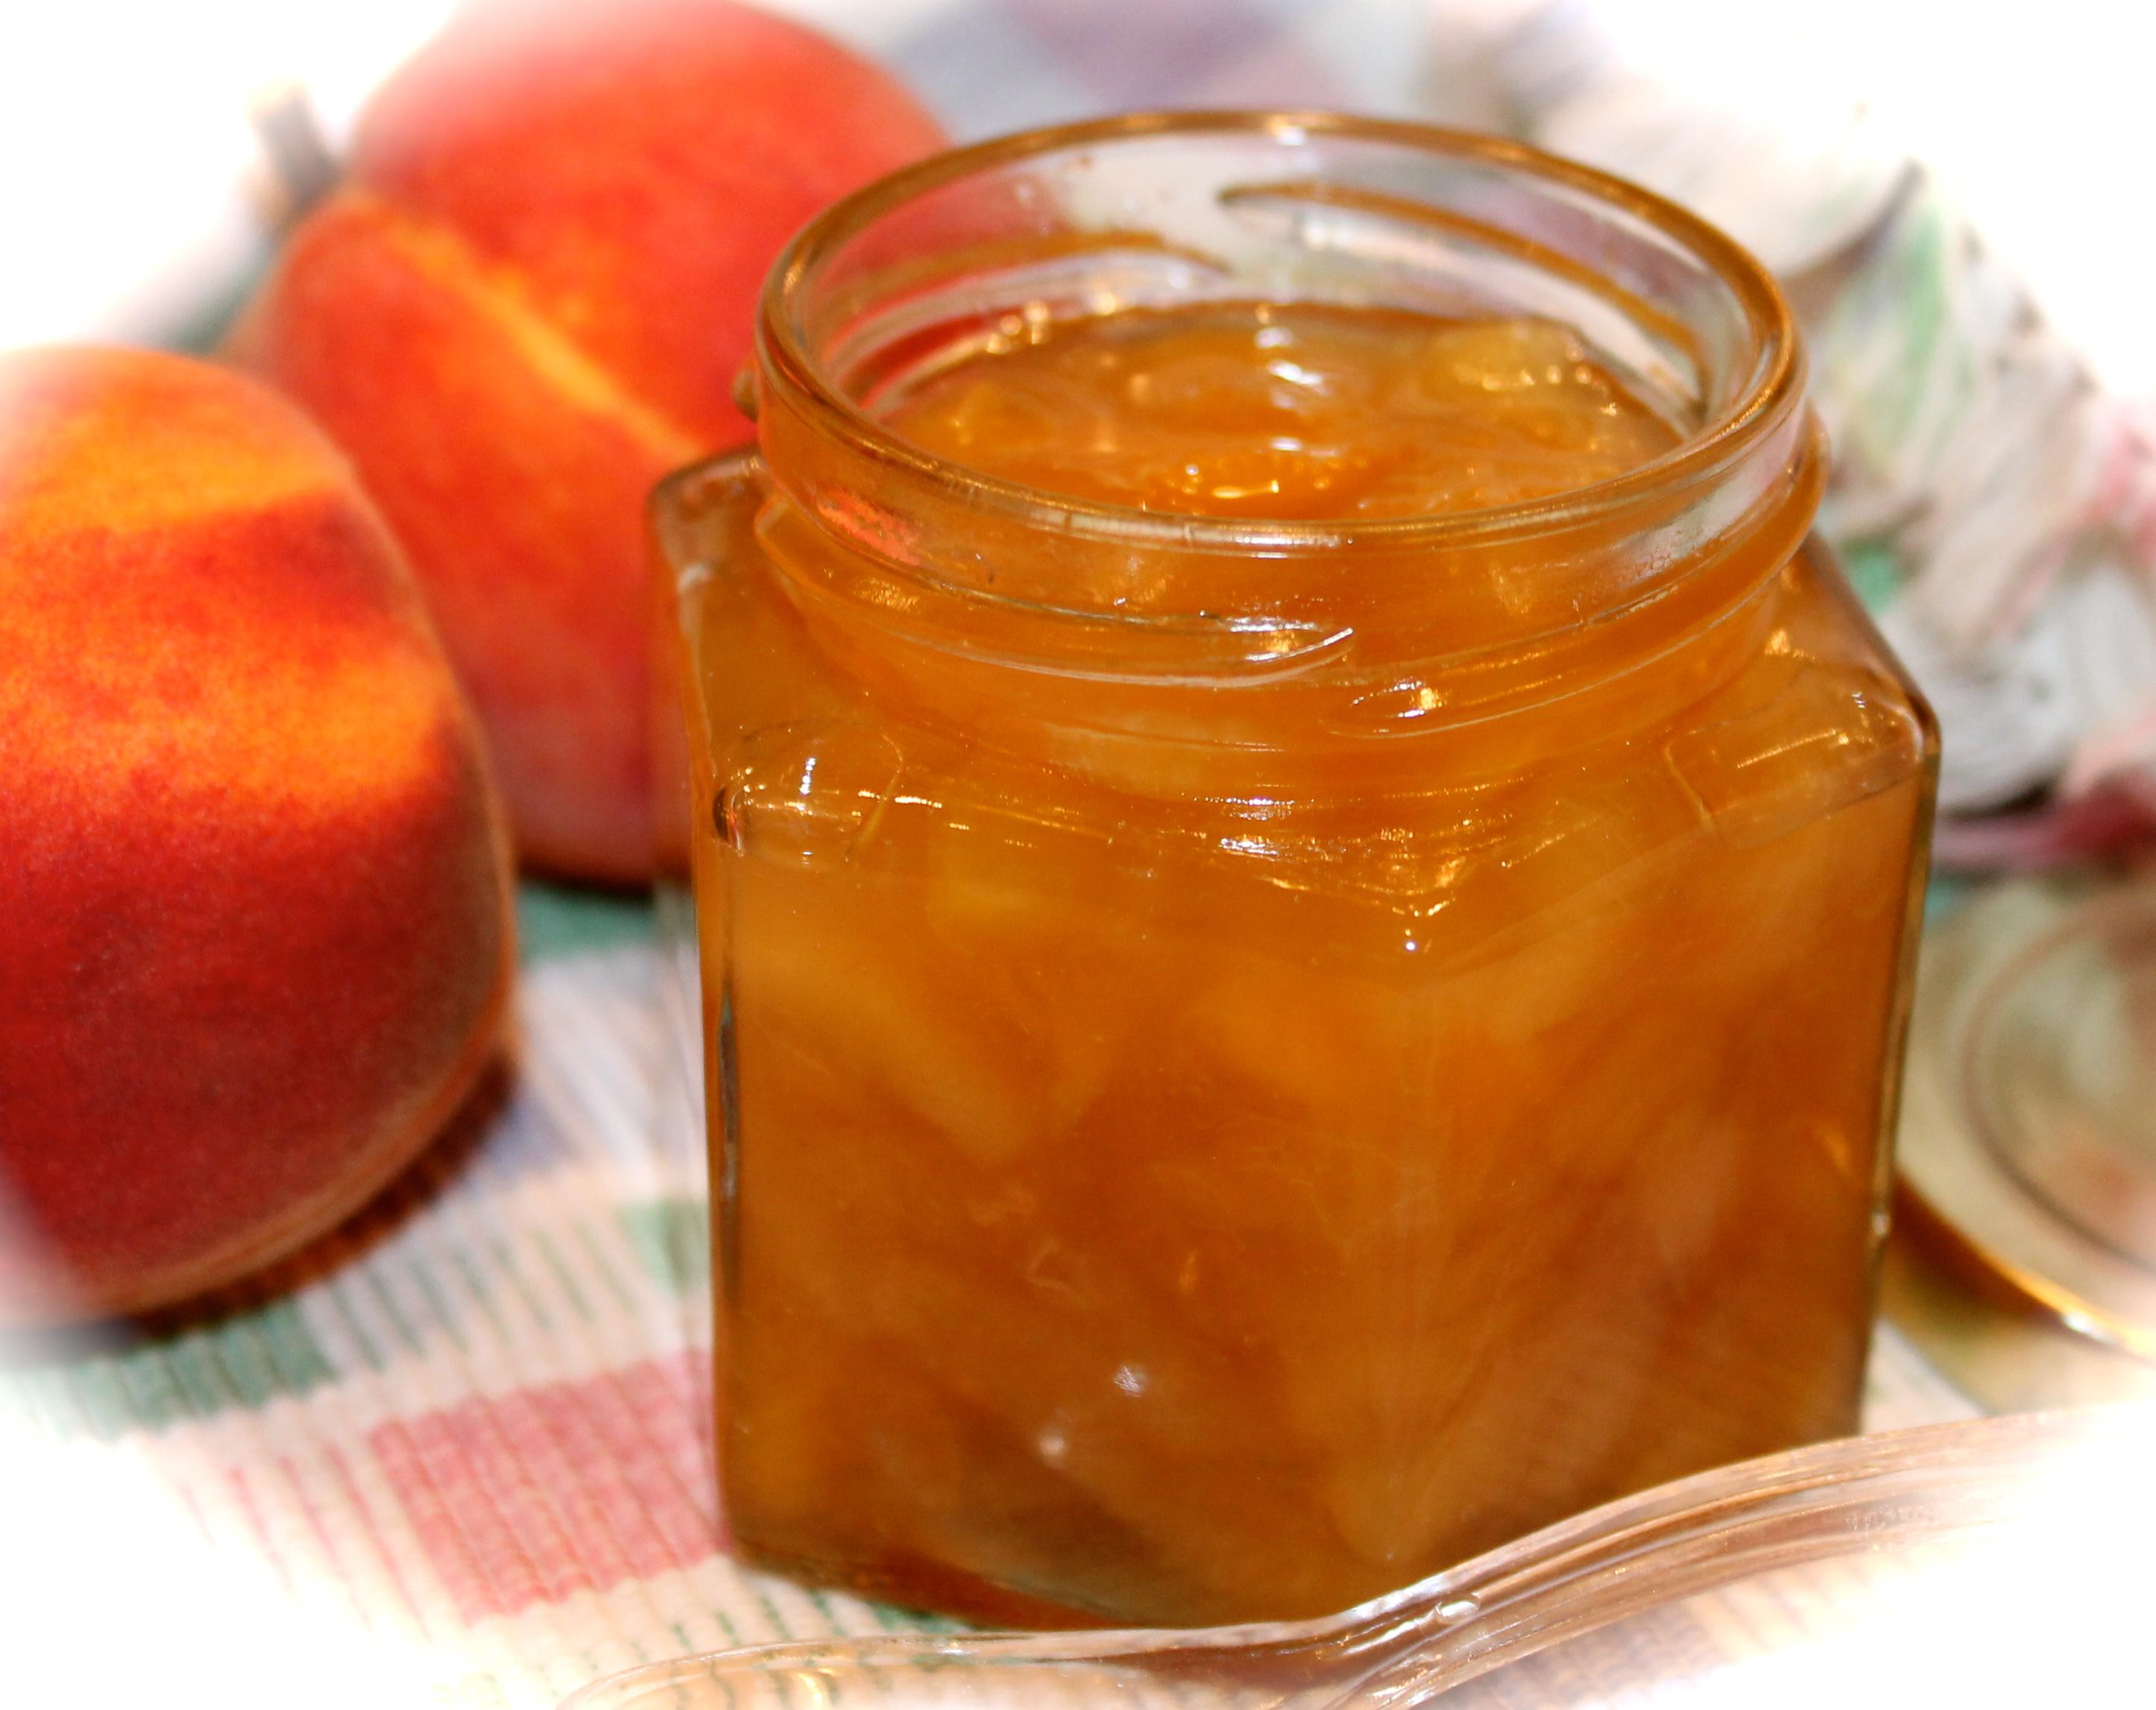 Peach Perserves